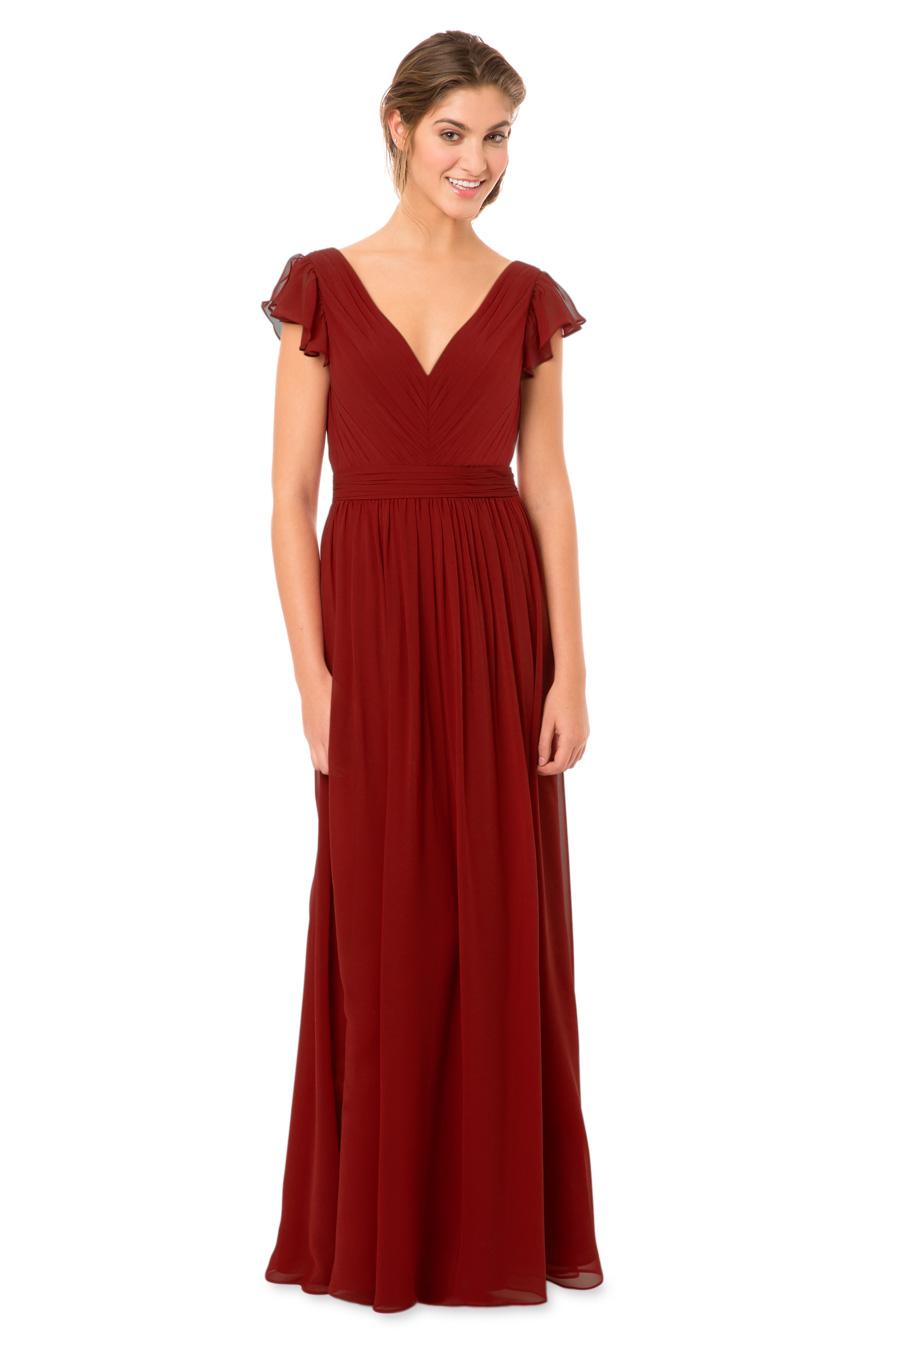 30 gorgeous autumnwinter bridesmaid dresses weddingsonline barijay style 1550 ombrellifo Choice Image